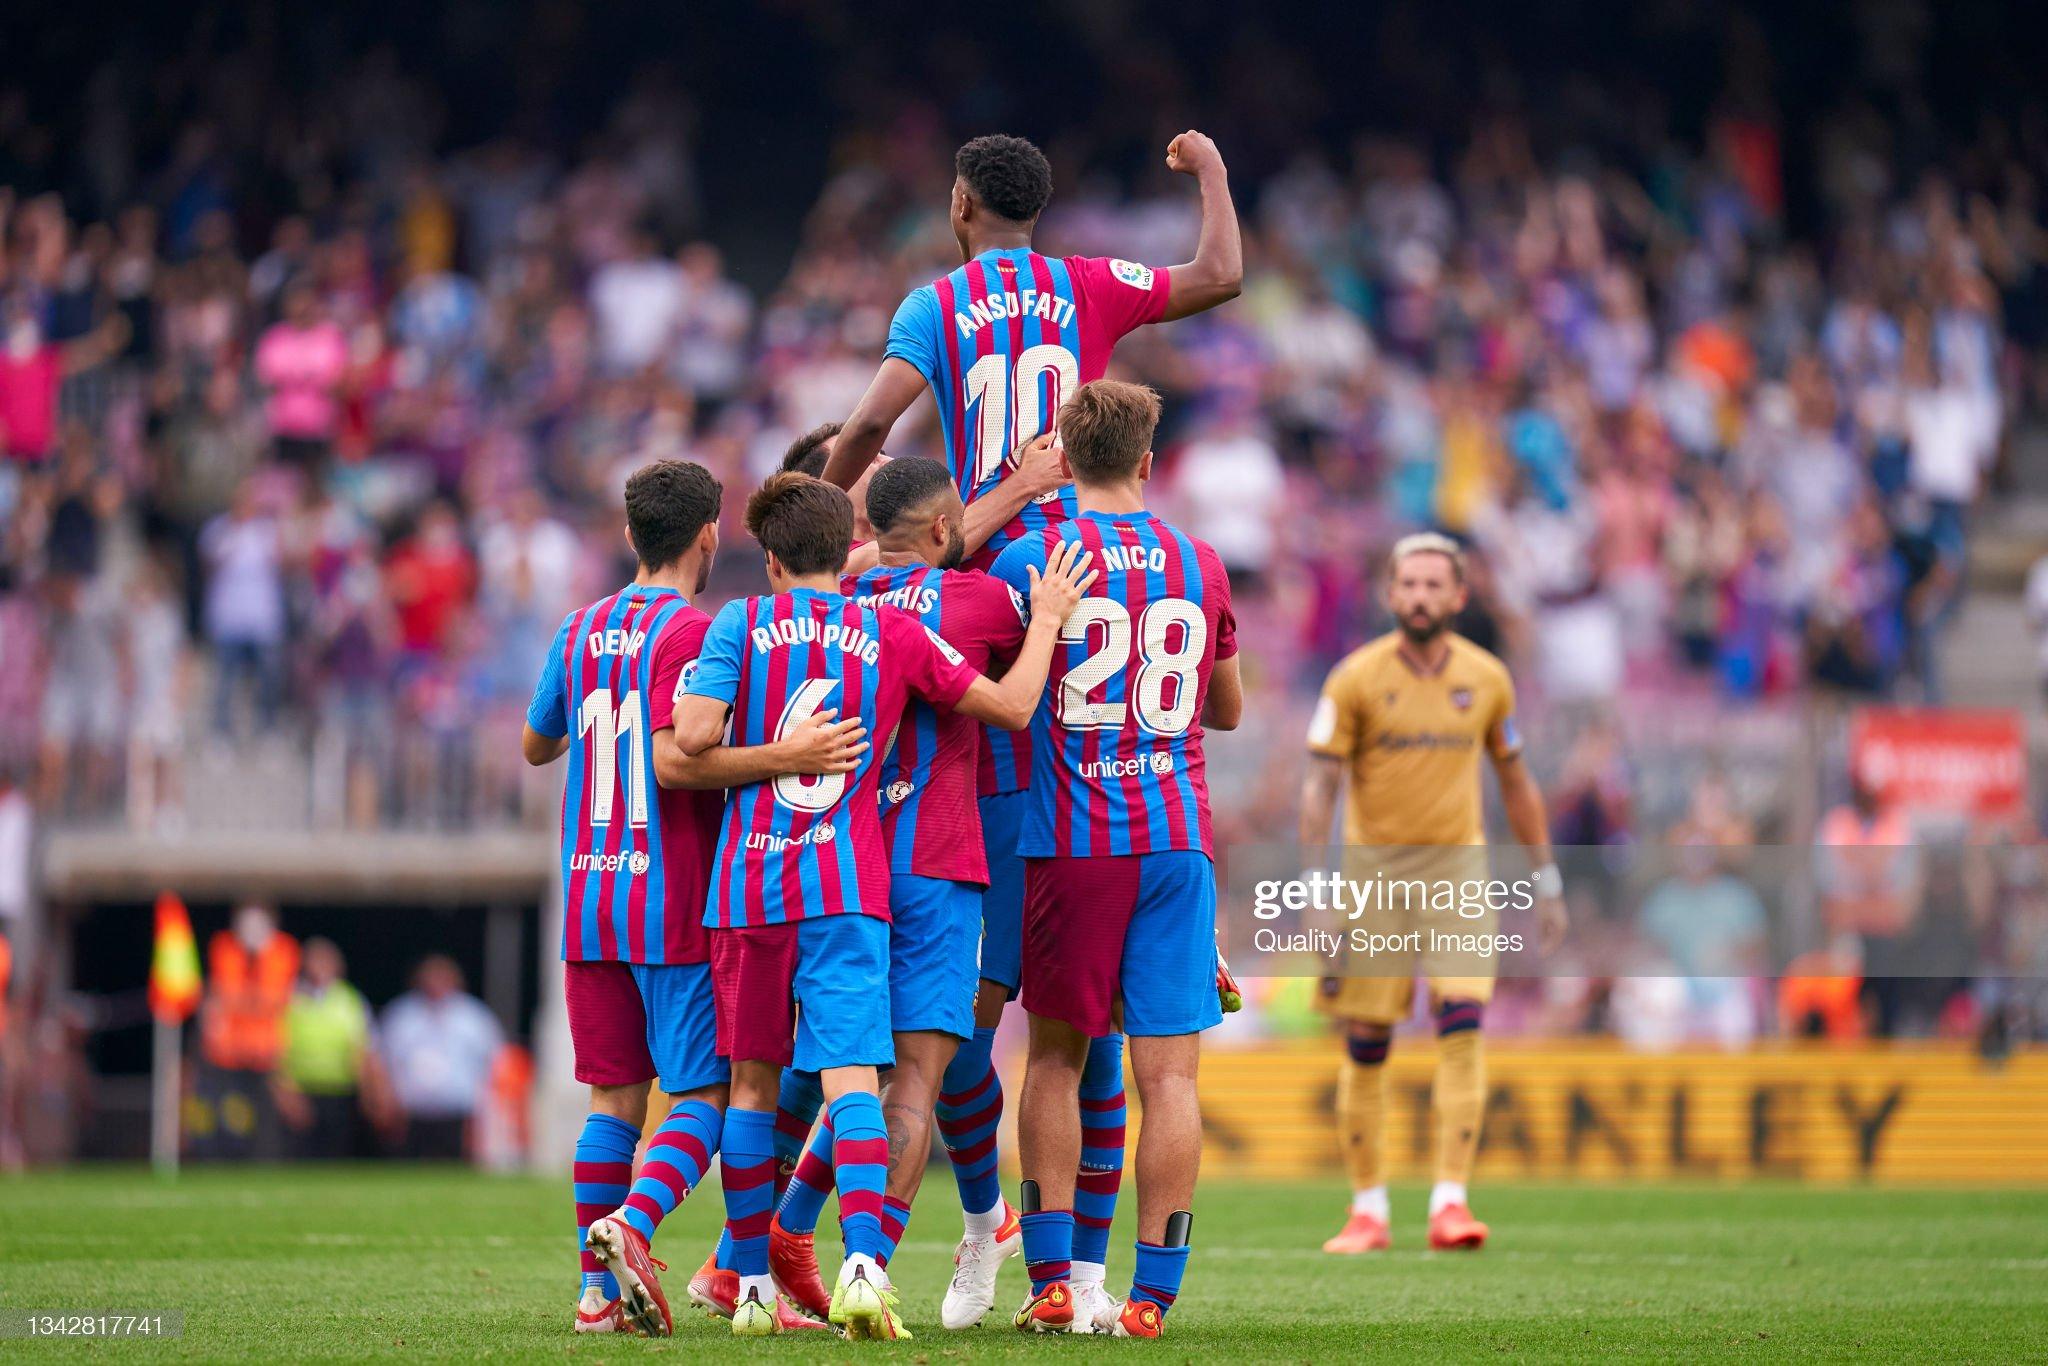 Ansu Fati - Page 3 Ansu-fati-of-fc-barcelona-celebrates-with-team-mates-after-scoring-picture-id1342817741?s=2048x2048